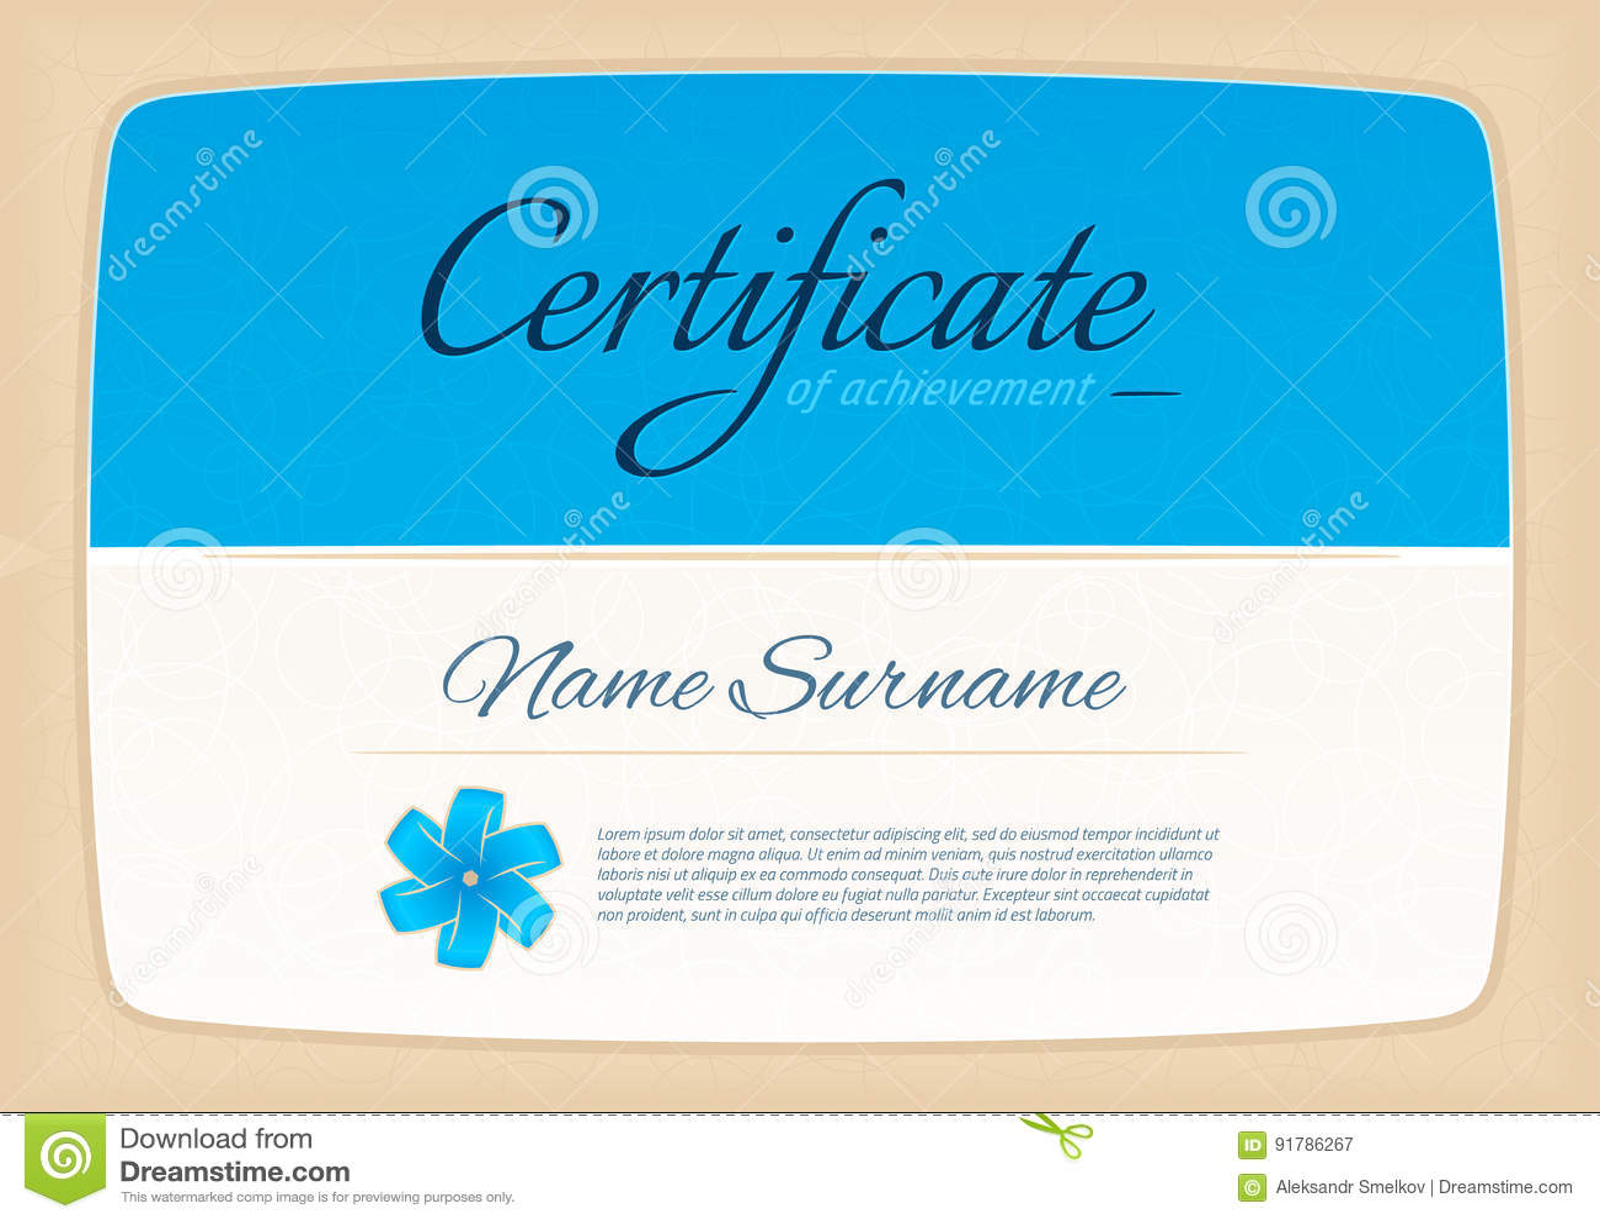 Certificate awards diploma horizontal in a4 size pattern stock certificate awards diploma horizontal in a4 size pattern 1betcityfo Image collections